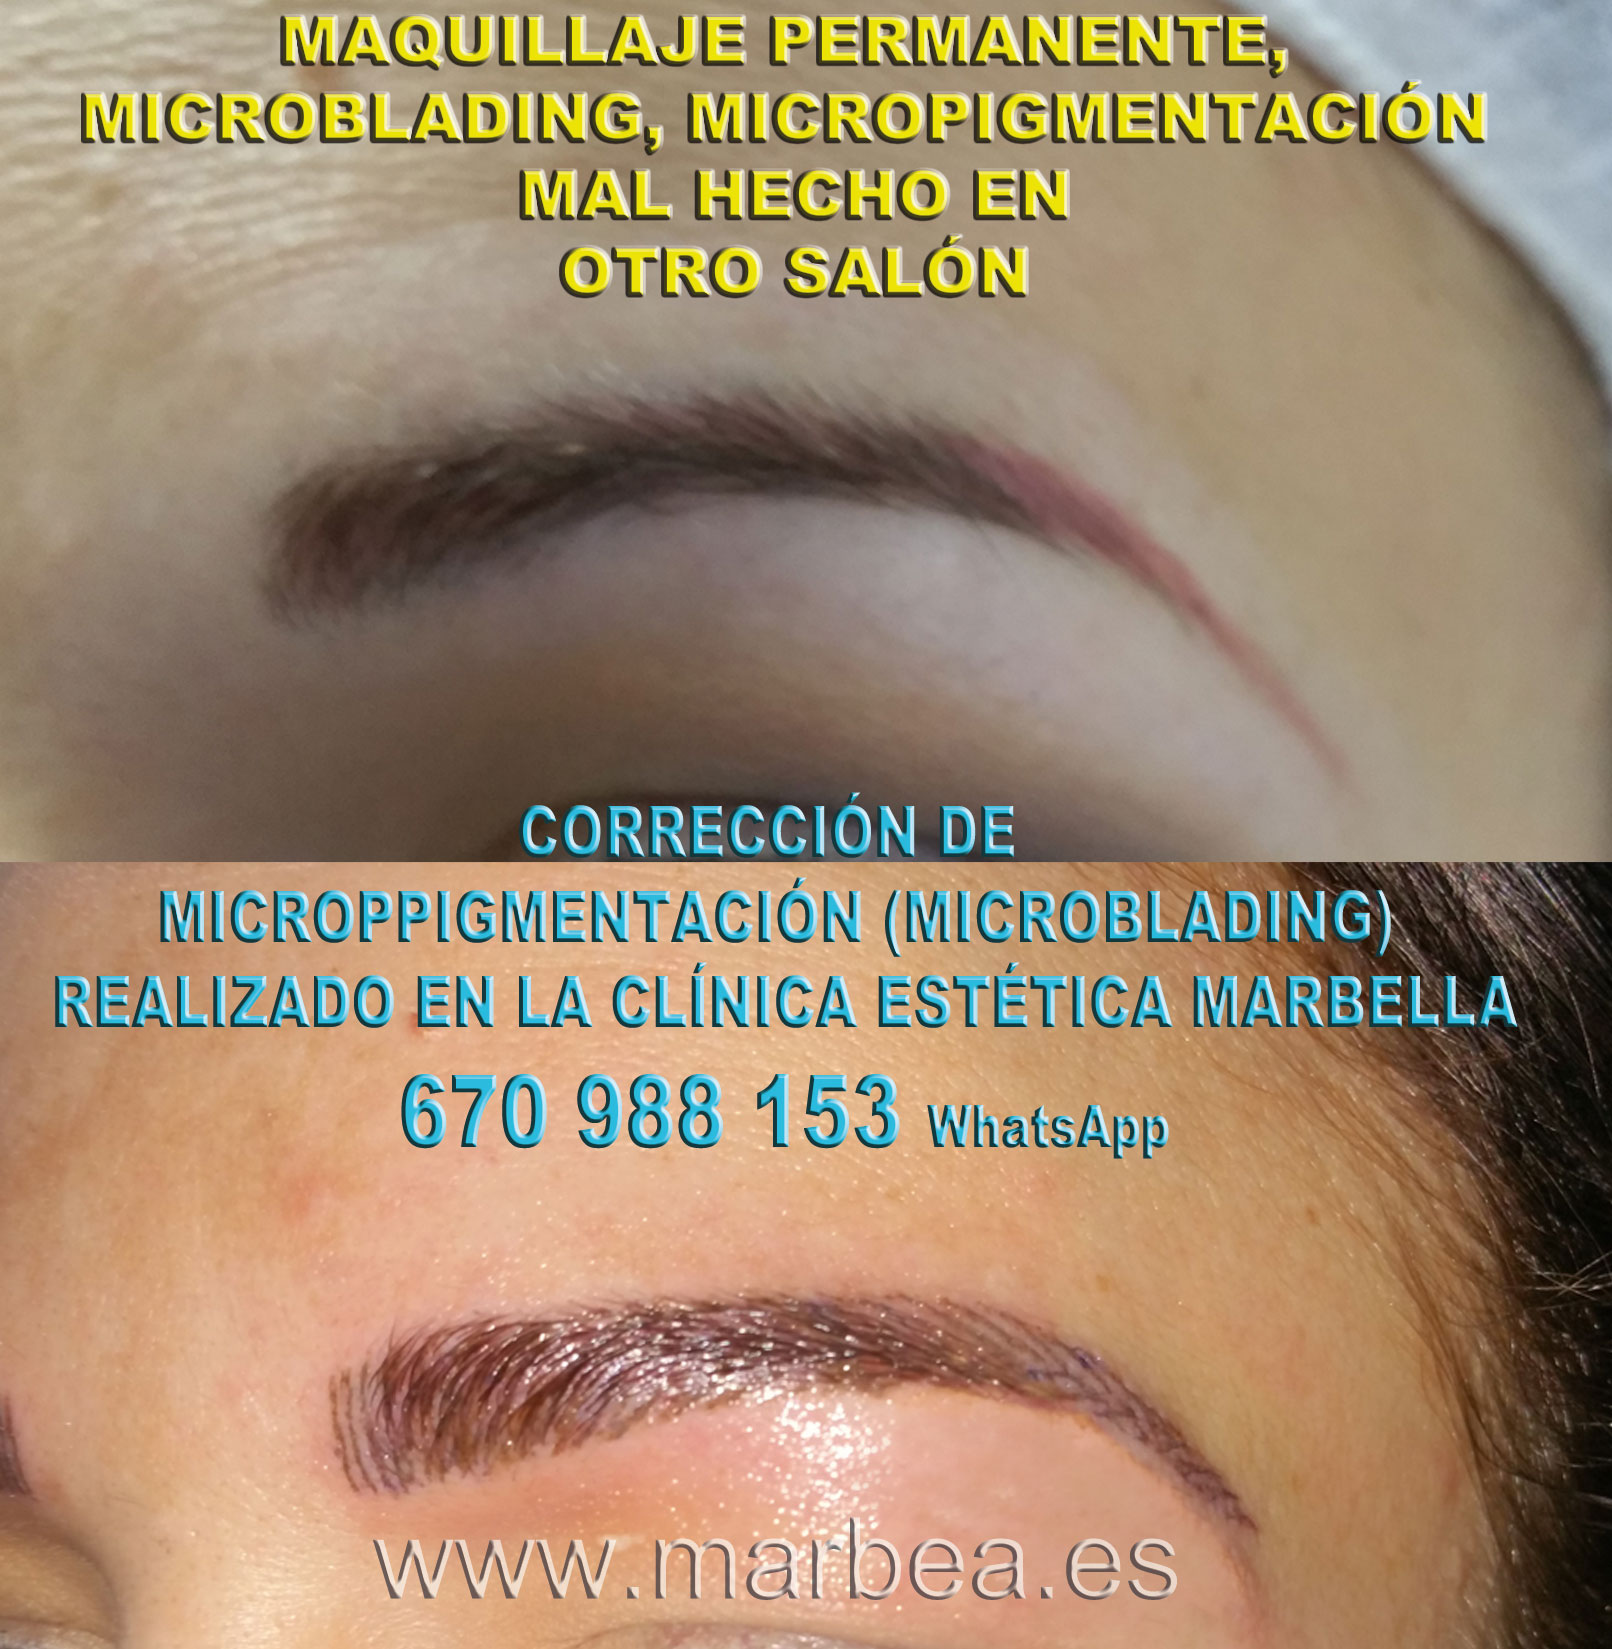 QUITAR TATUAJE CEJAS clínica estética tatuaje ofrenda como aclarar la micropigmentación cejas,corregir micropigmentación no deseada